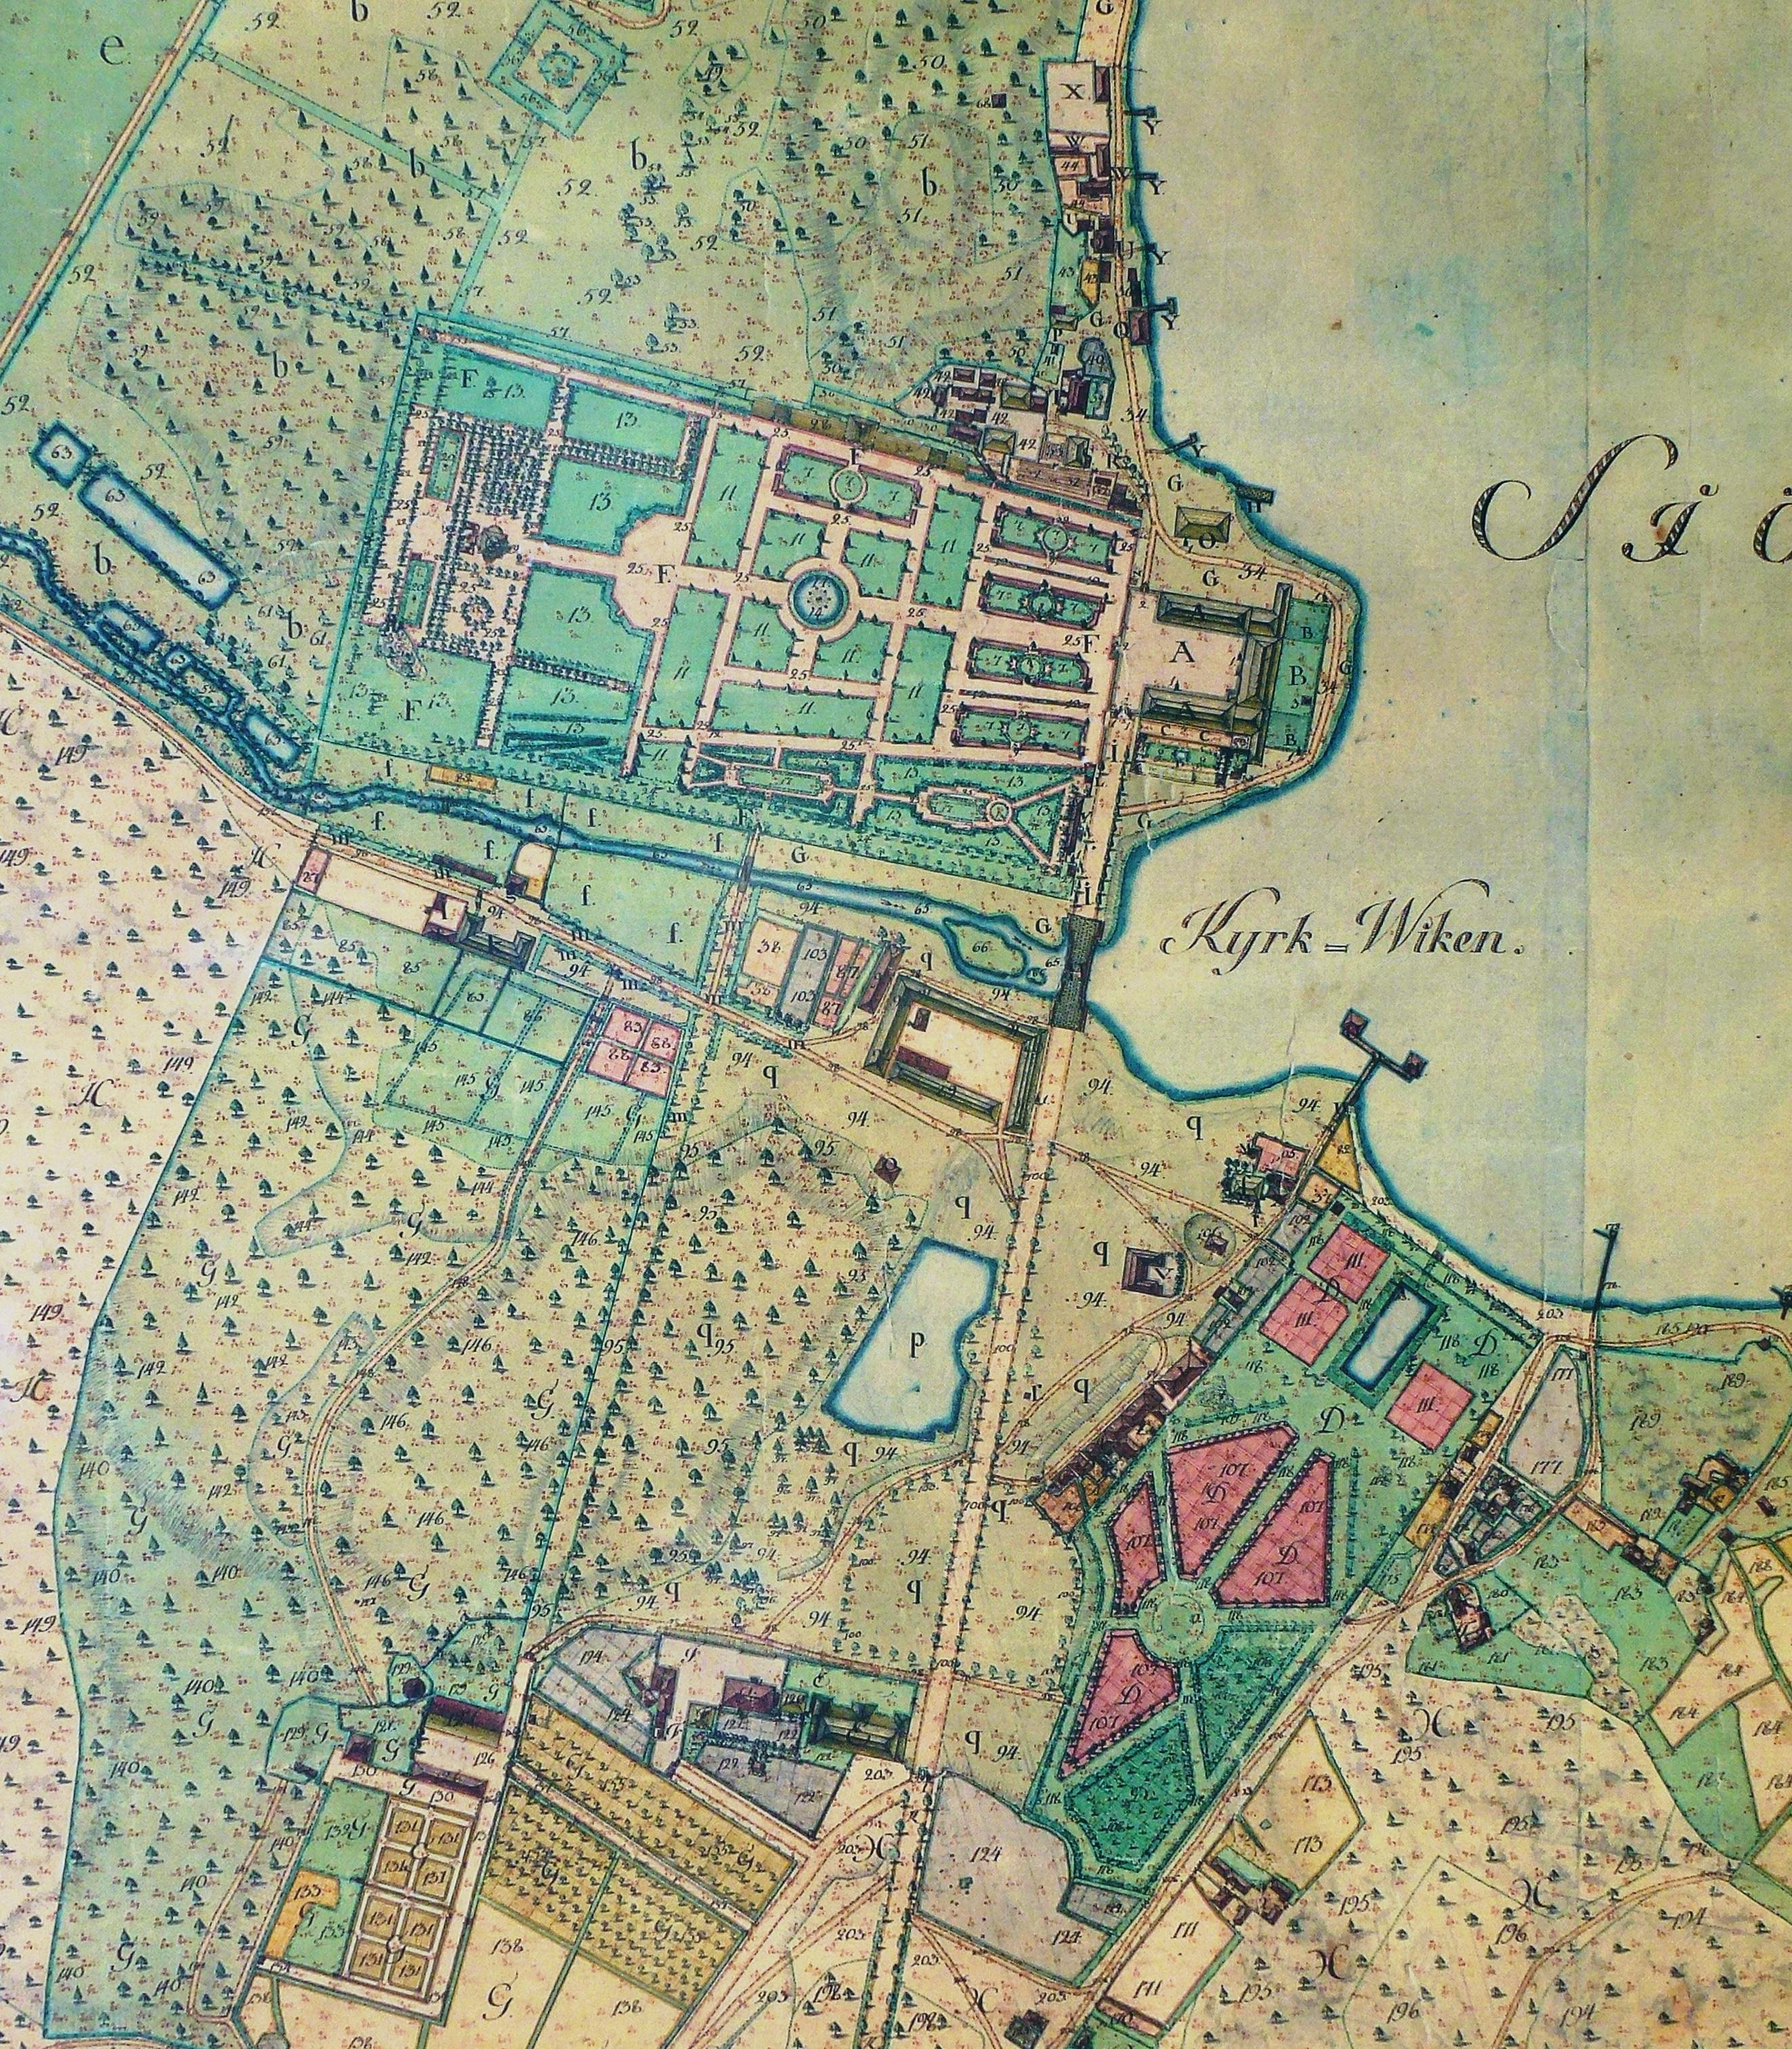 Gratis Guidad Tur Pa Wenngarn Slott Destination Sigtuna